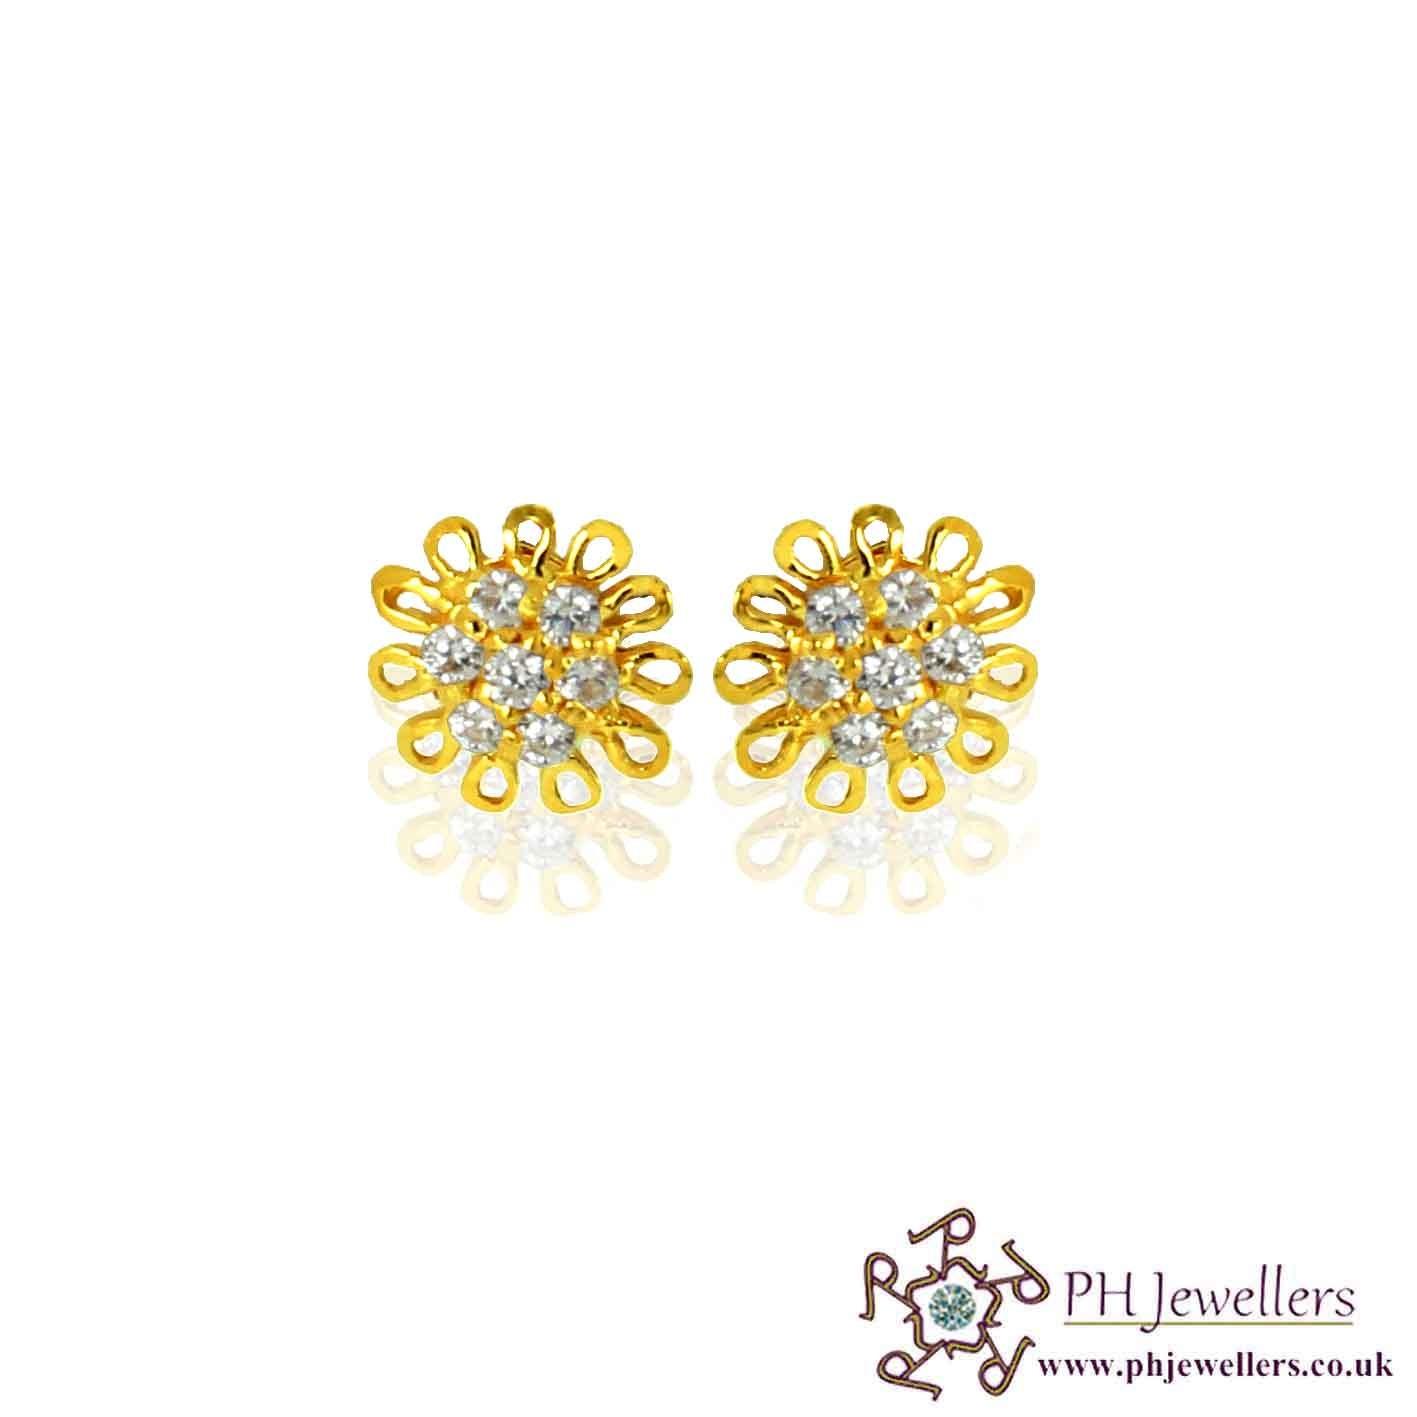 22ct 916 Yellow Gold Earring CZ SE46